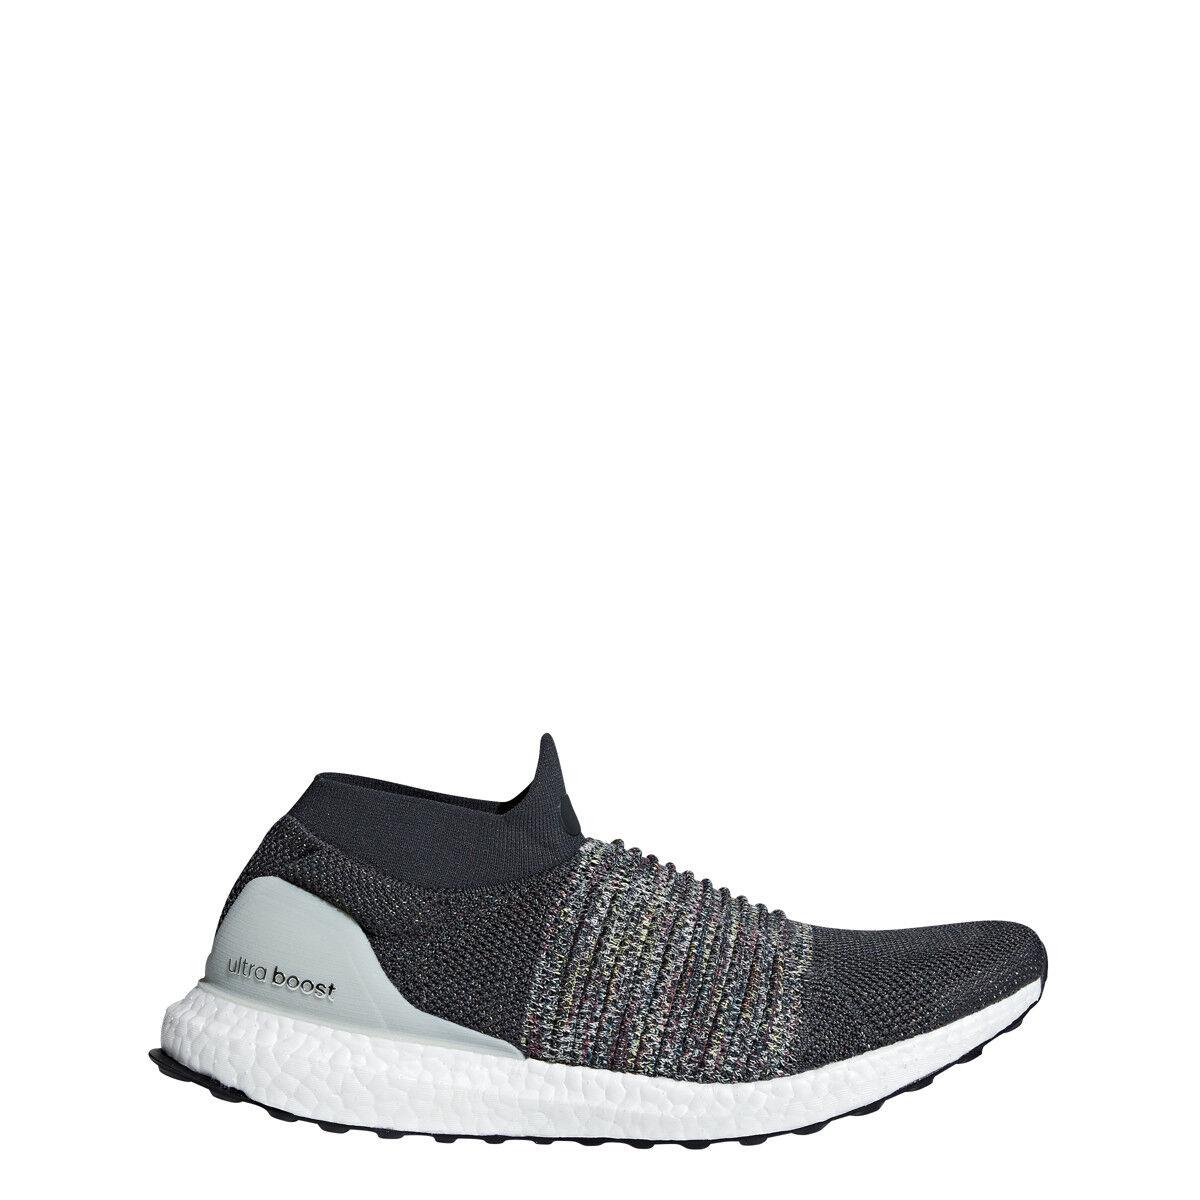 Adidas Mens ULTRABOOST LACELESS LACELESS LACELESS Carbon grau Silber - CM8267 d6c9ad